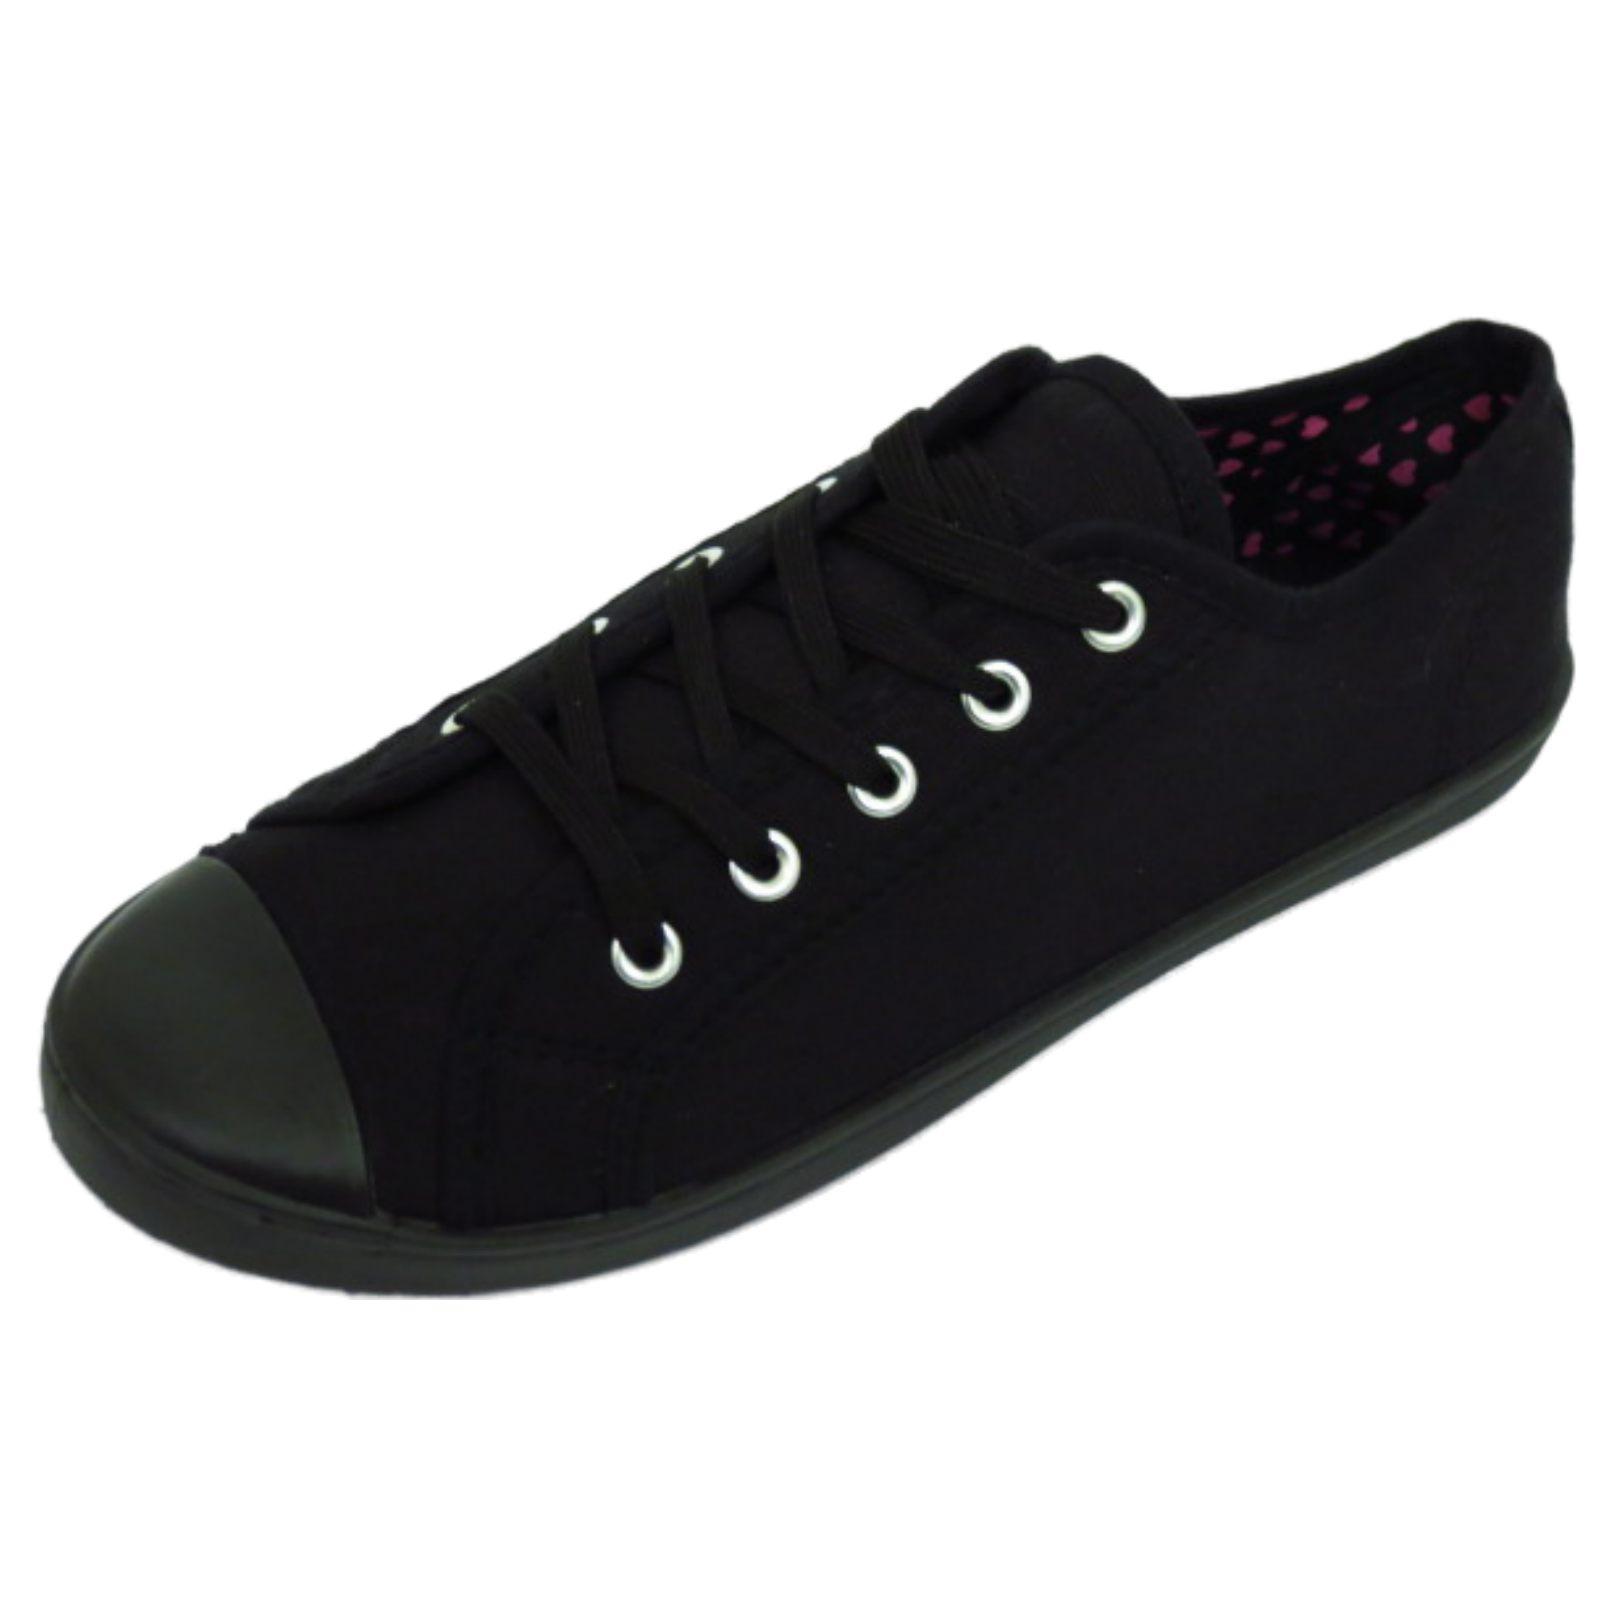 Womens Dance Shoes Ebay